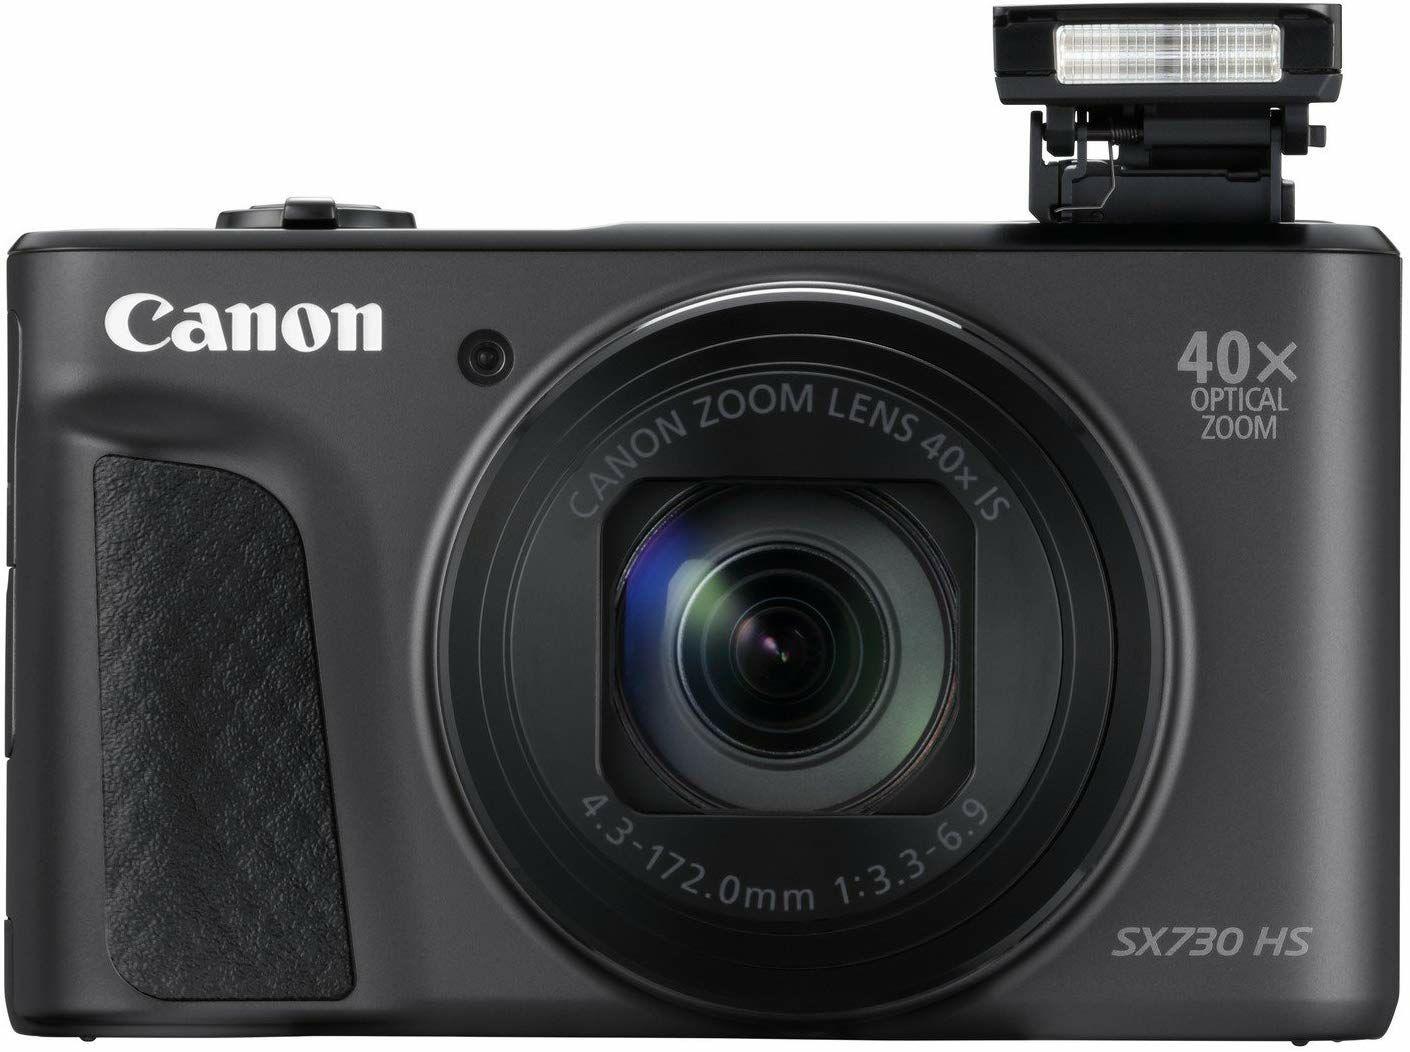 Canon PowerShot SX730 HS Digitalkamera - 20,3 MPix, 1080p / 60 BpS, 40x optischer Zoom, Wi-Fi, NFC, Bluetooth (Amazon.fr)